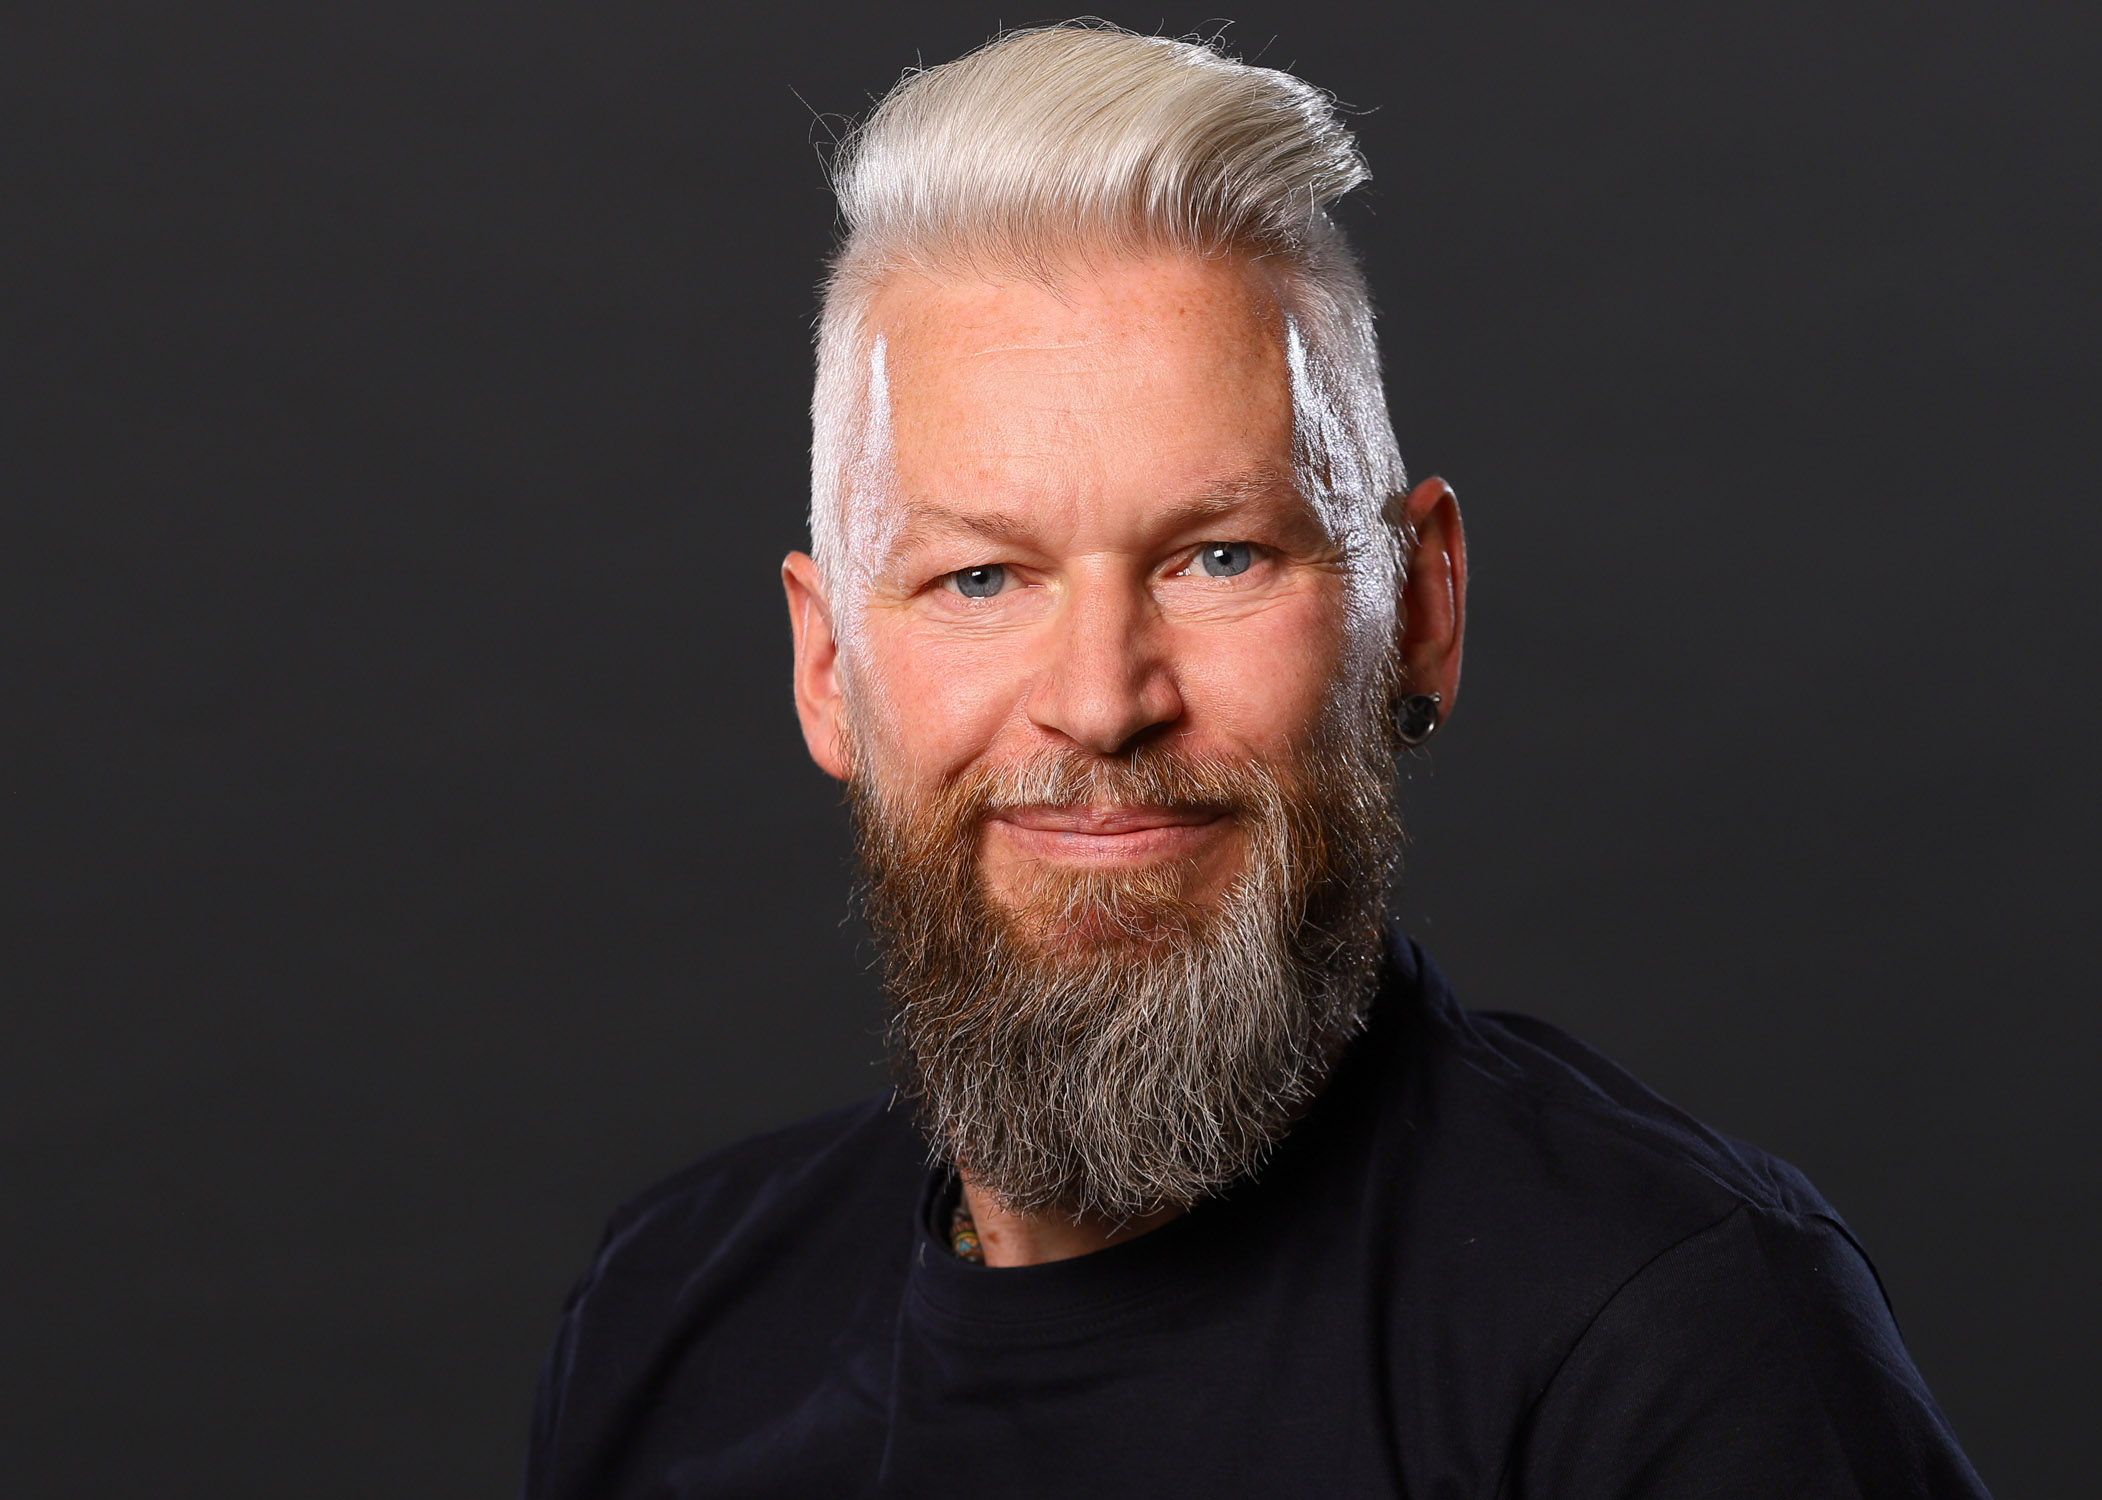 Sven Tietjen